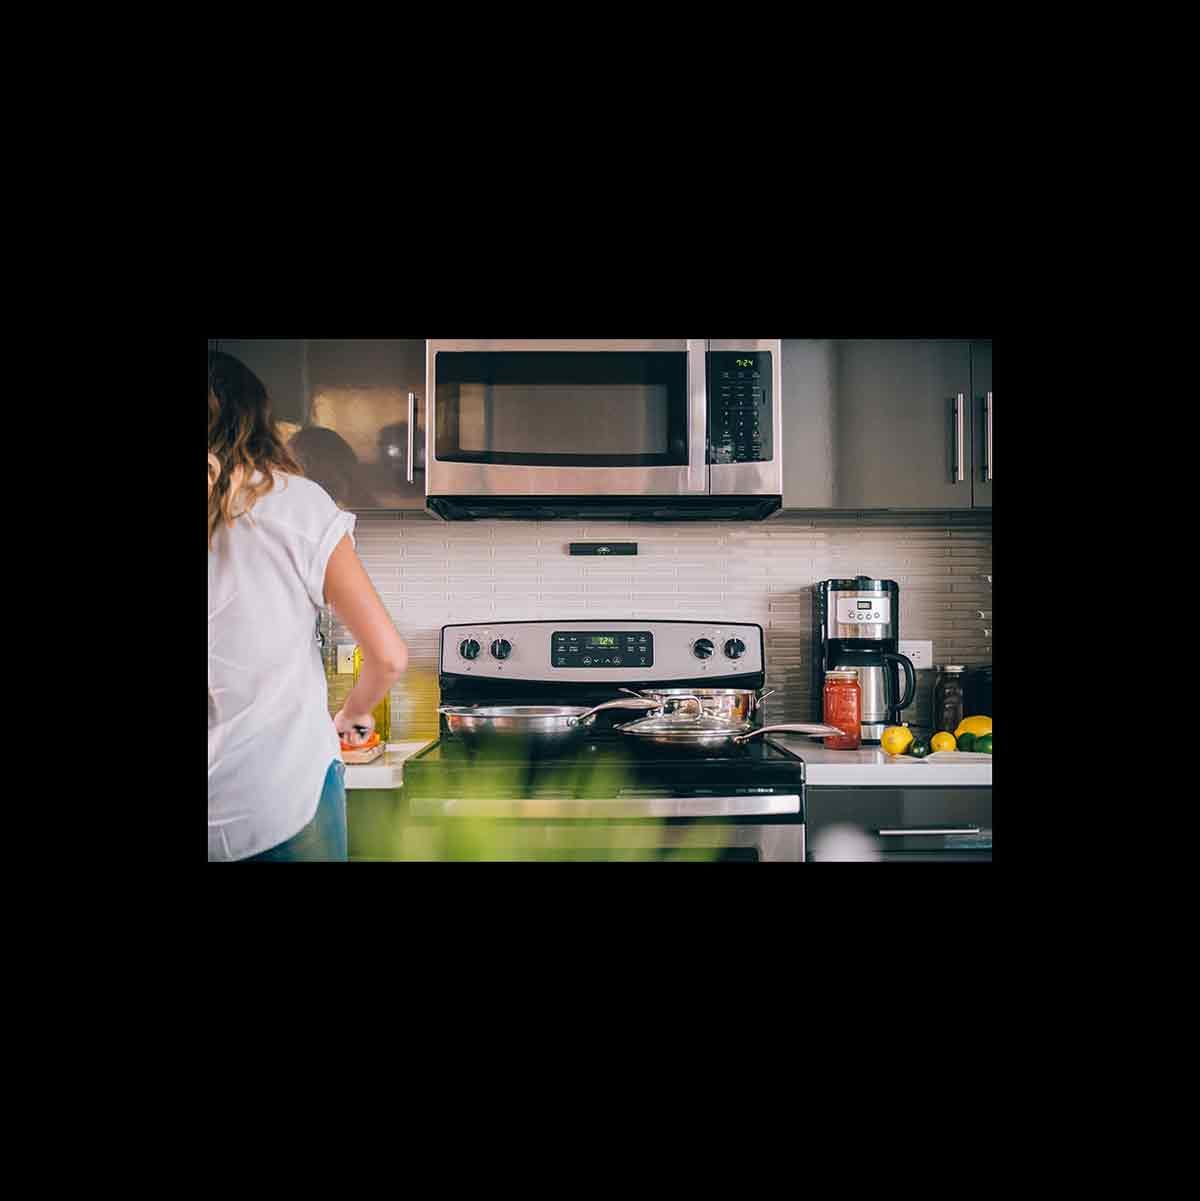 Safera Sense smart cooking sensor